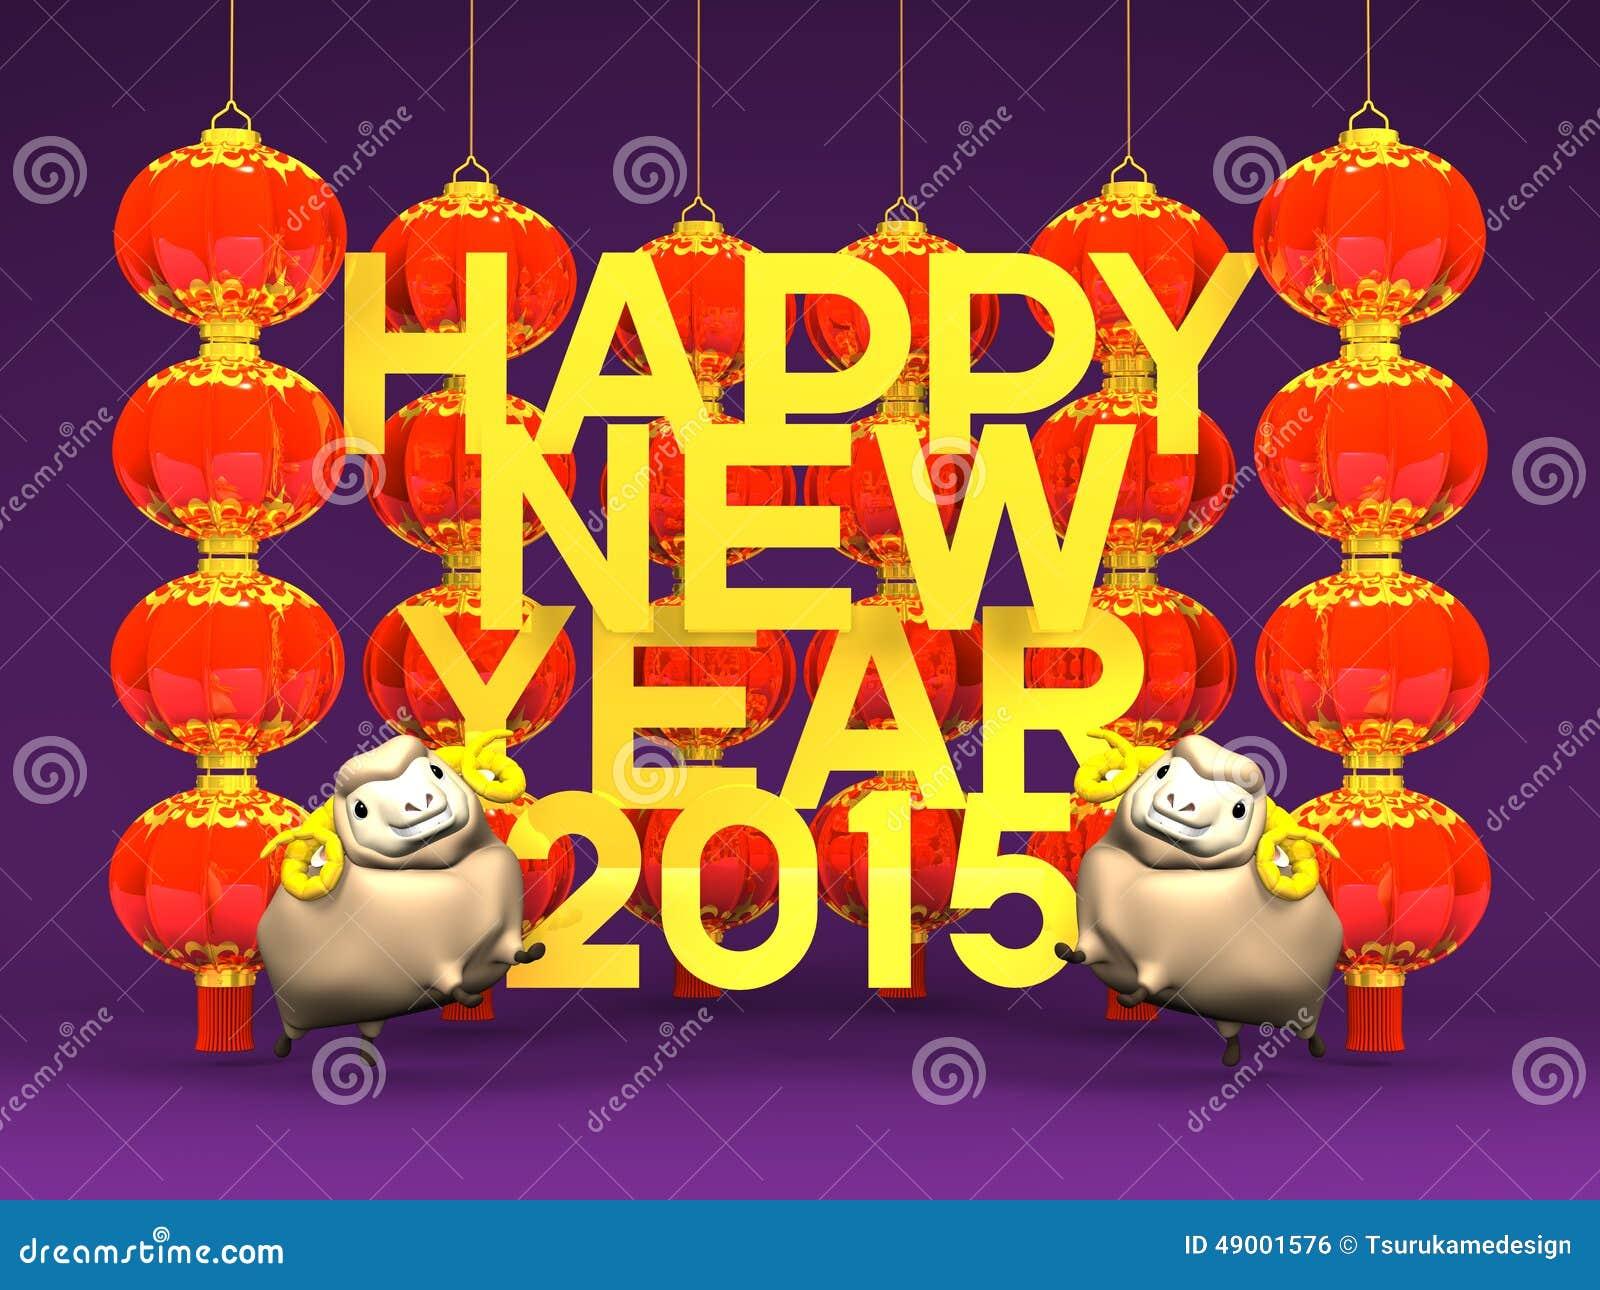 Many Lunar New Years Lanterns Sheep 2015 Greeting On Purple